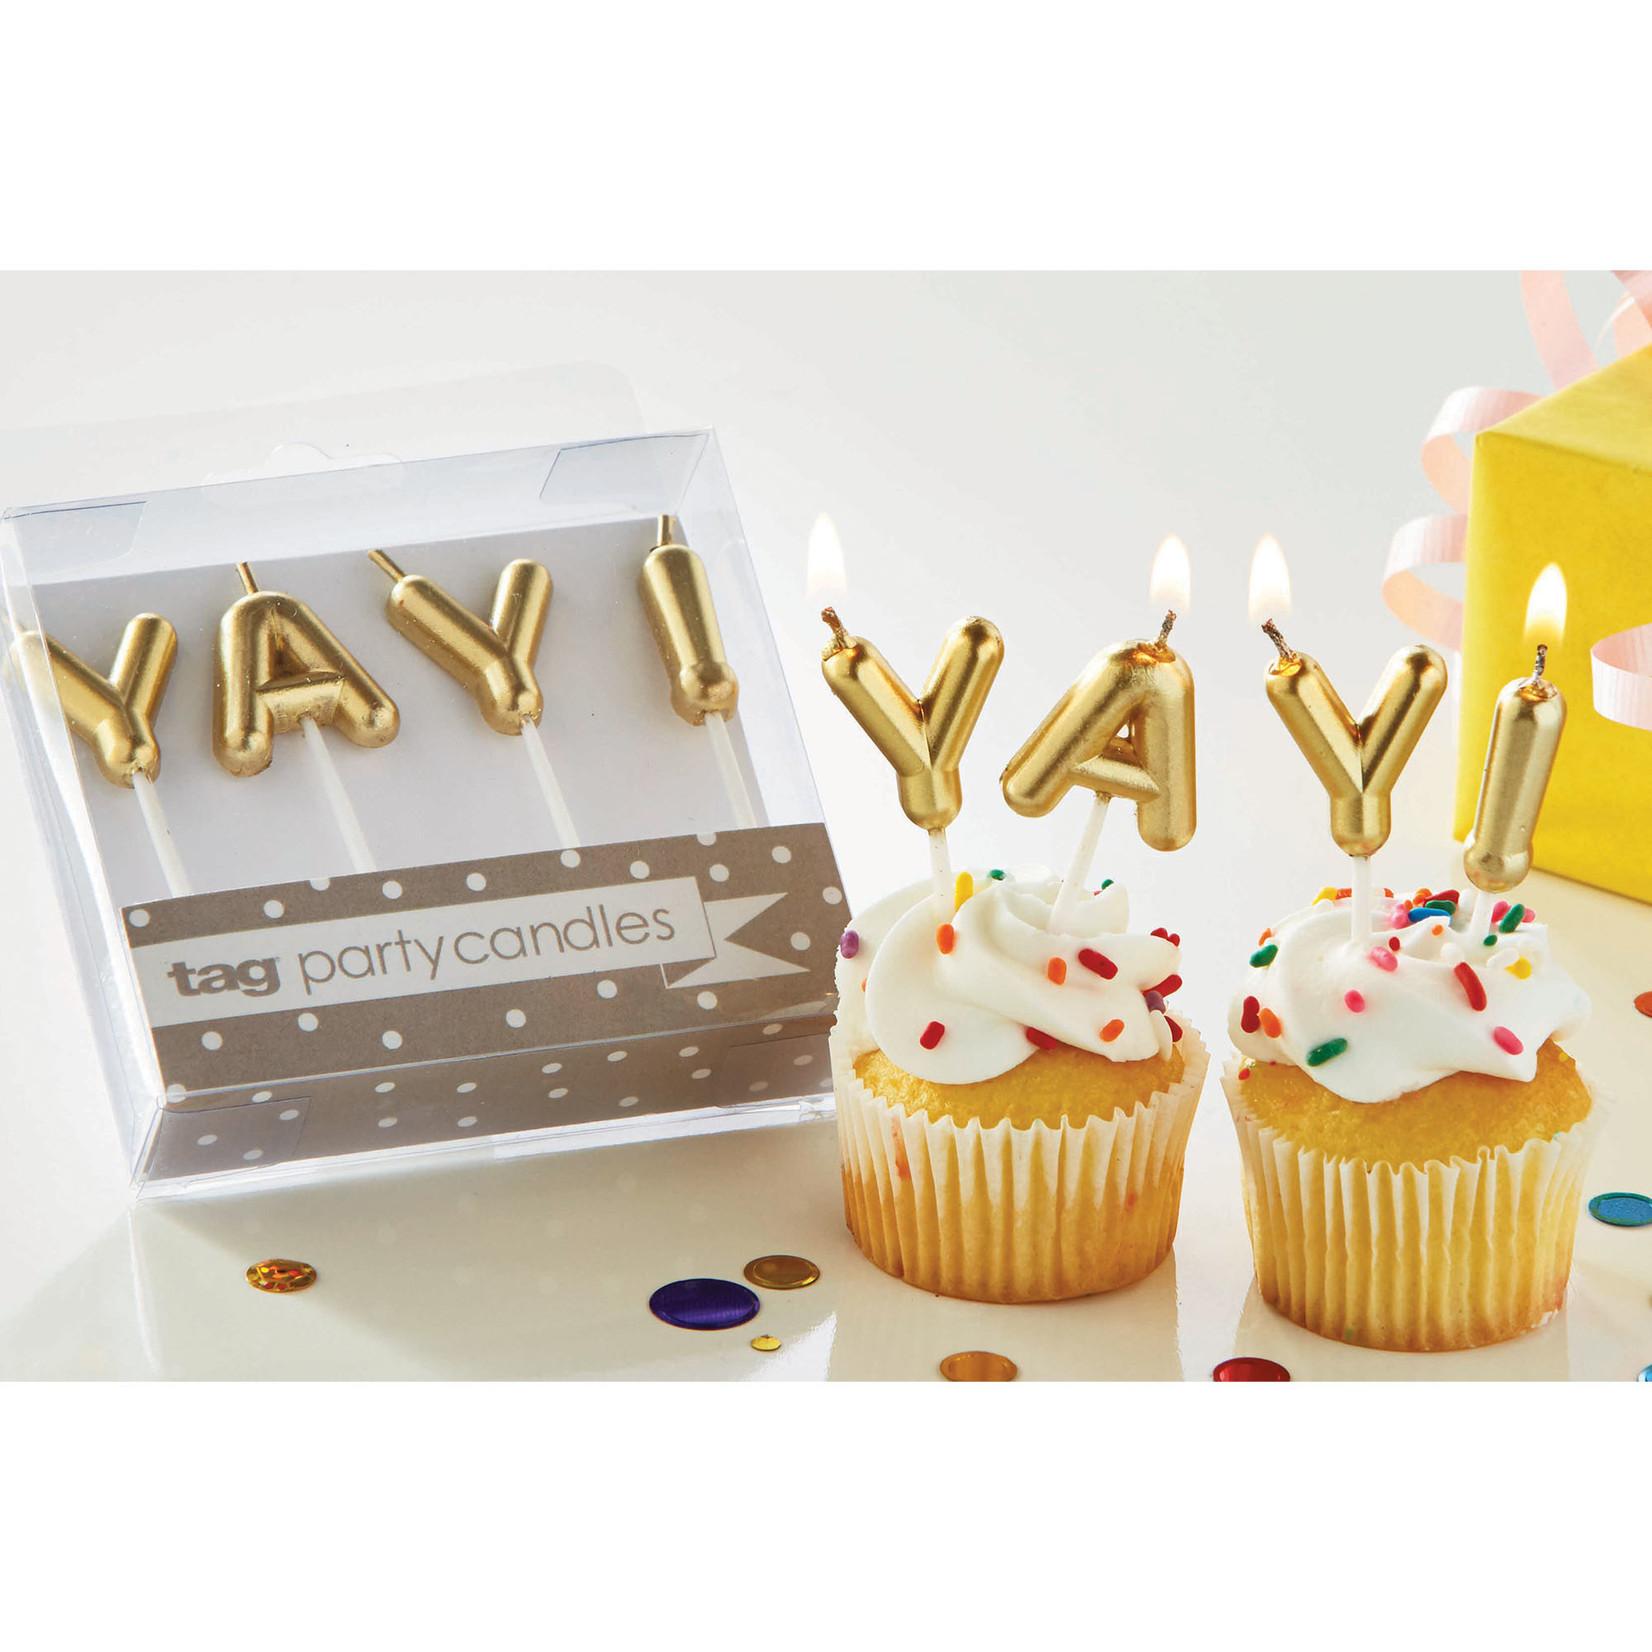 Rock Scissor Paper Yay! Birthday Candles